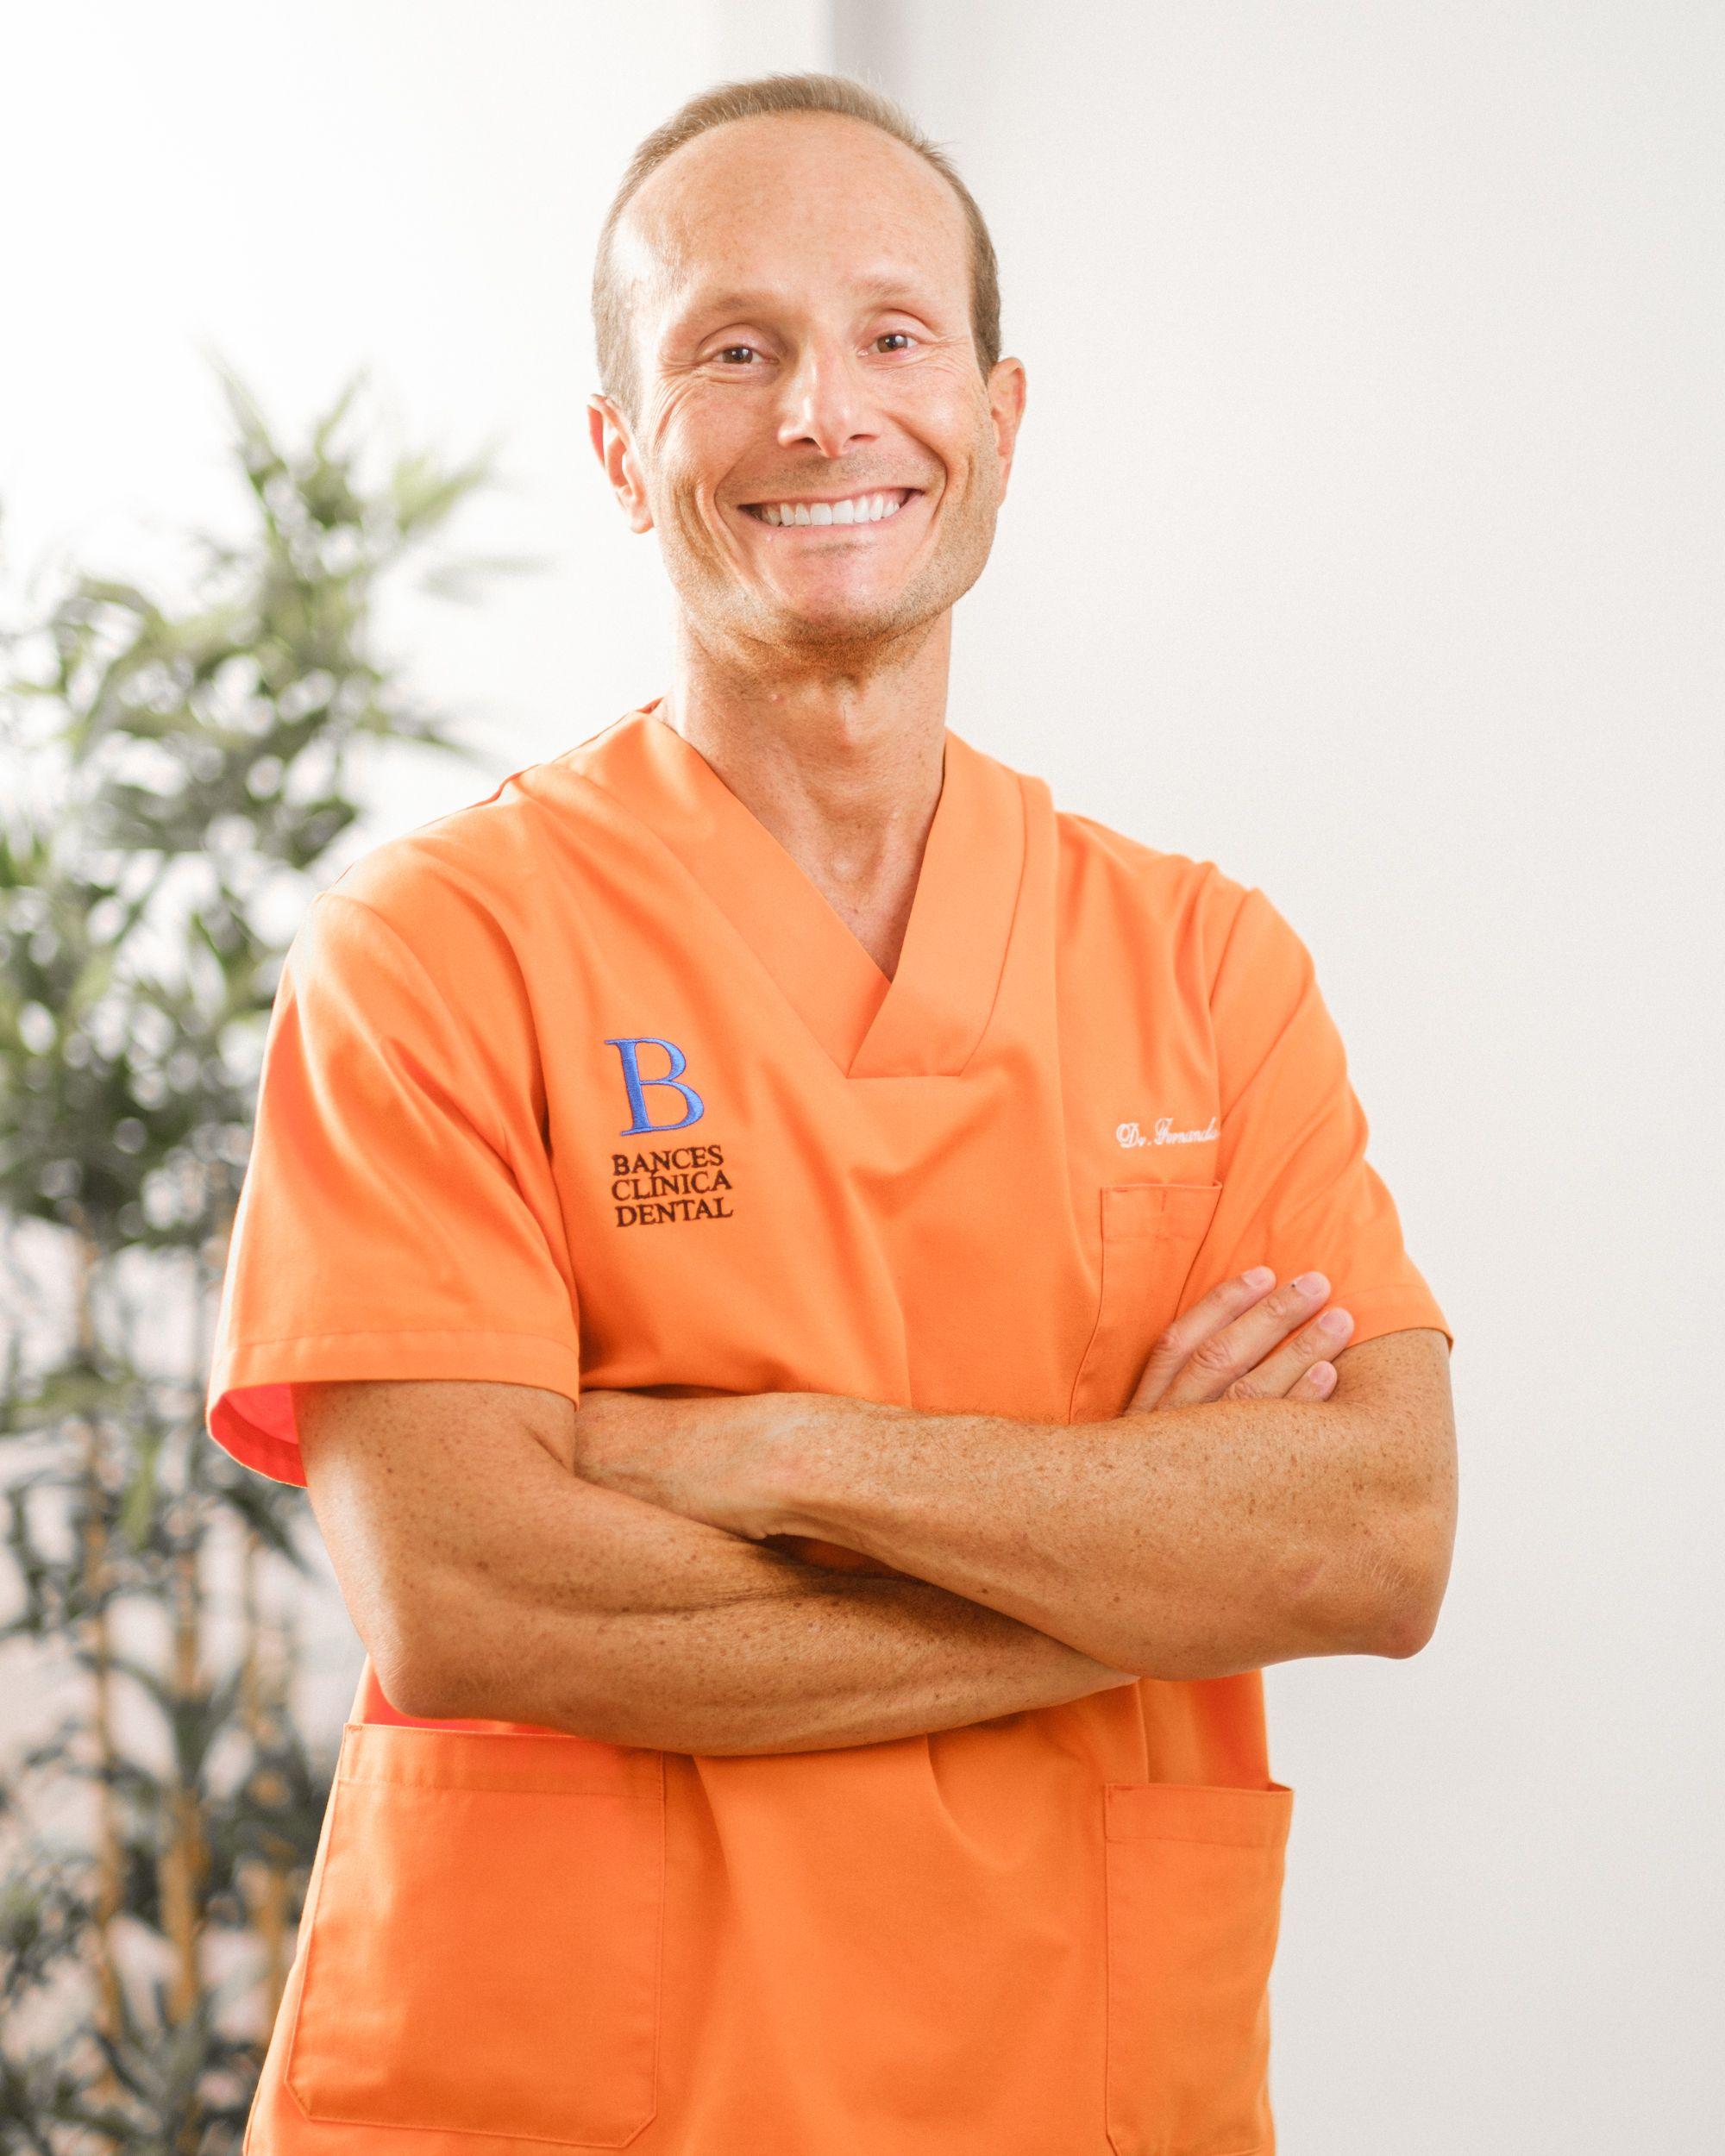 Dr. Fernando Bances Del Castillo